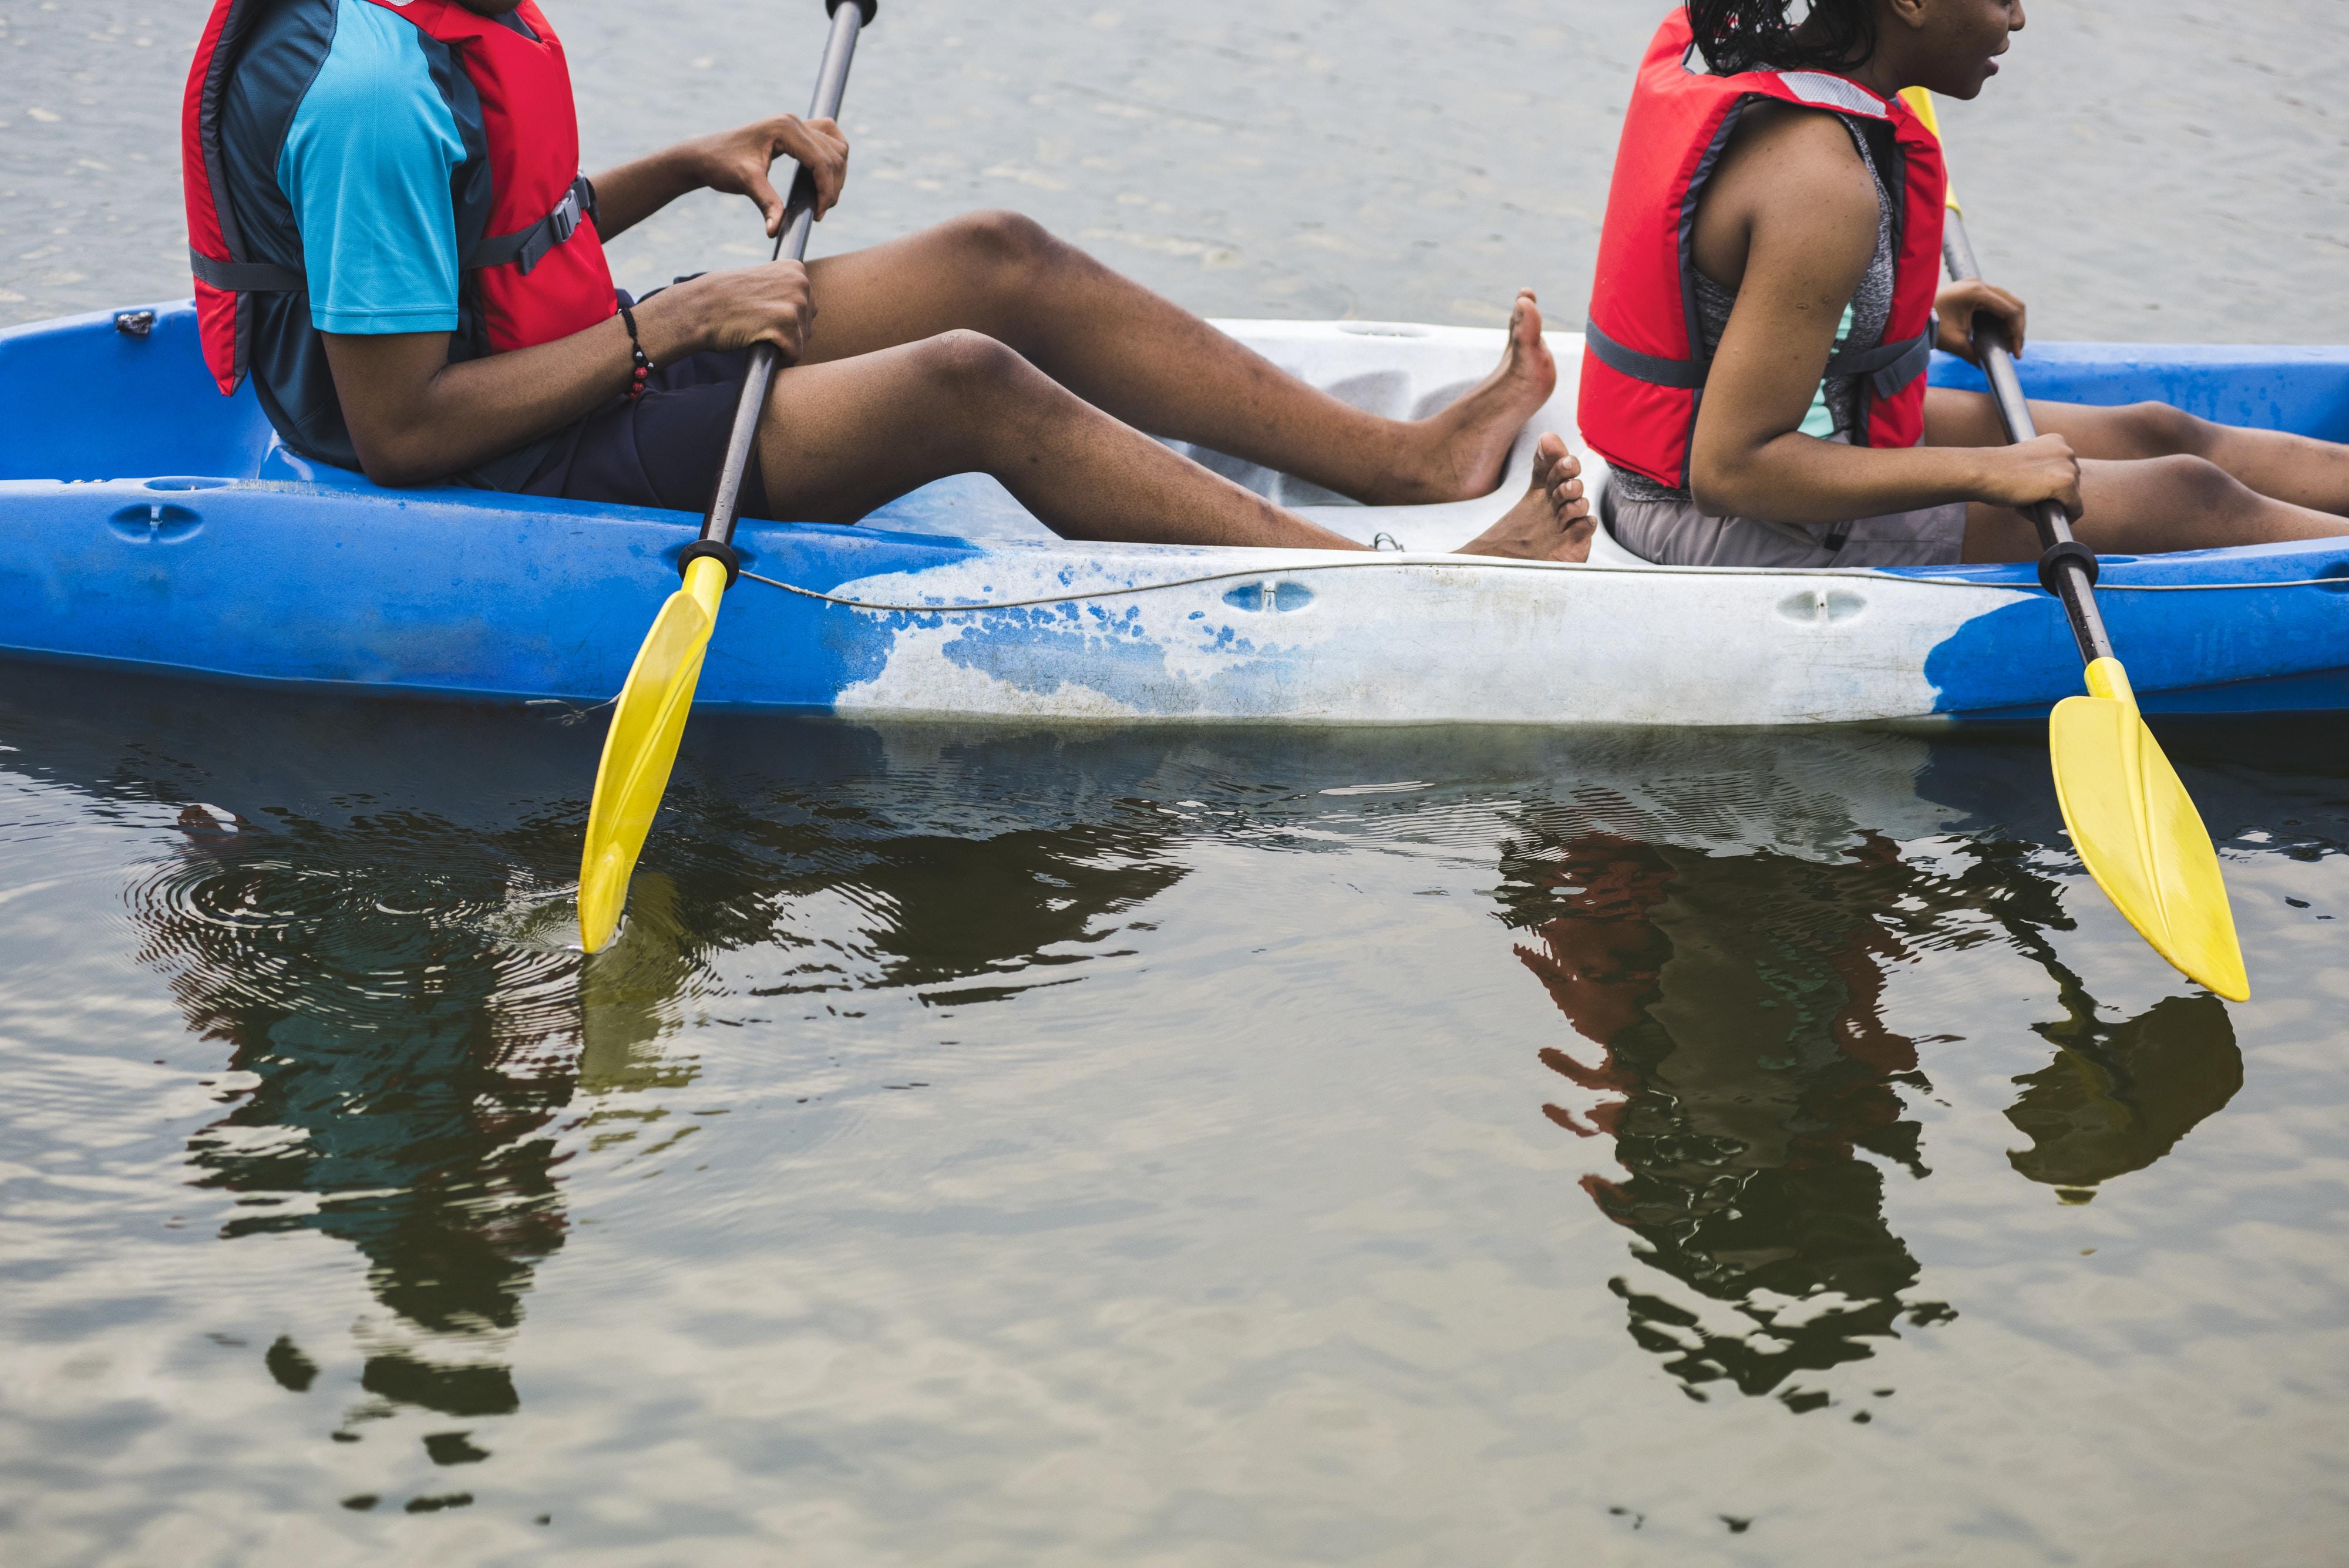 two person sailing kayak